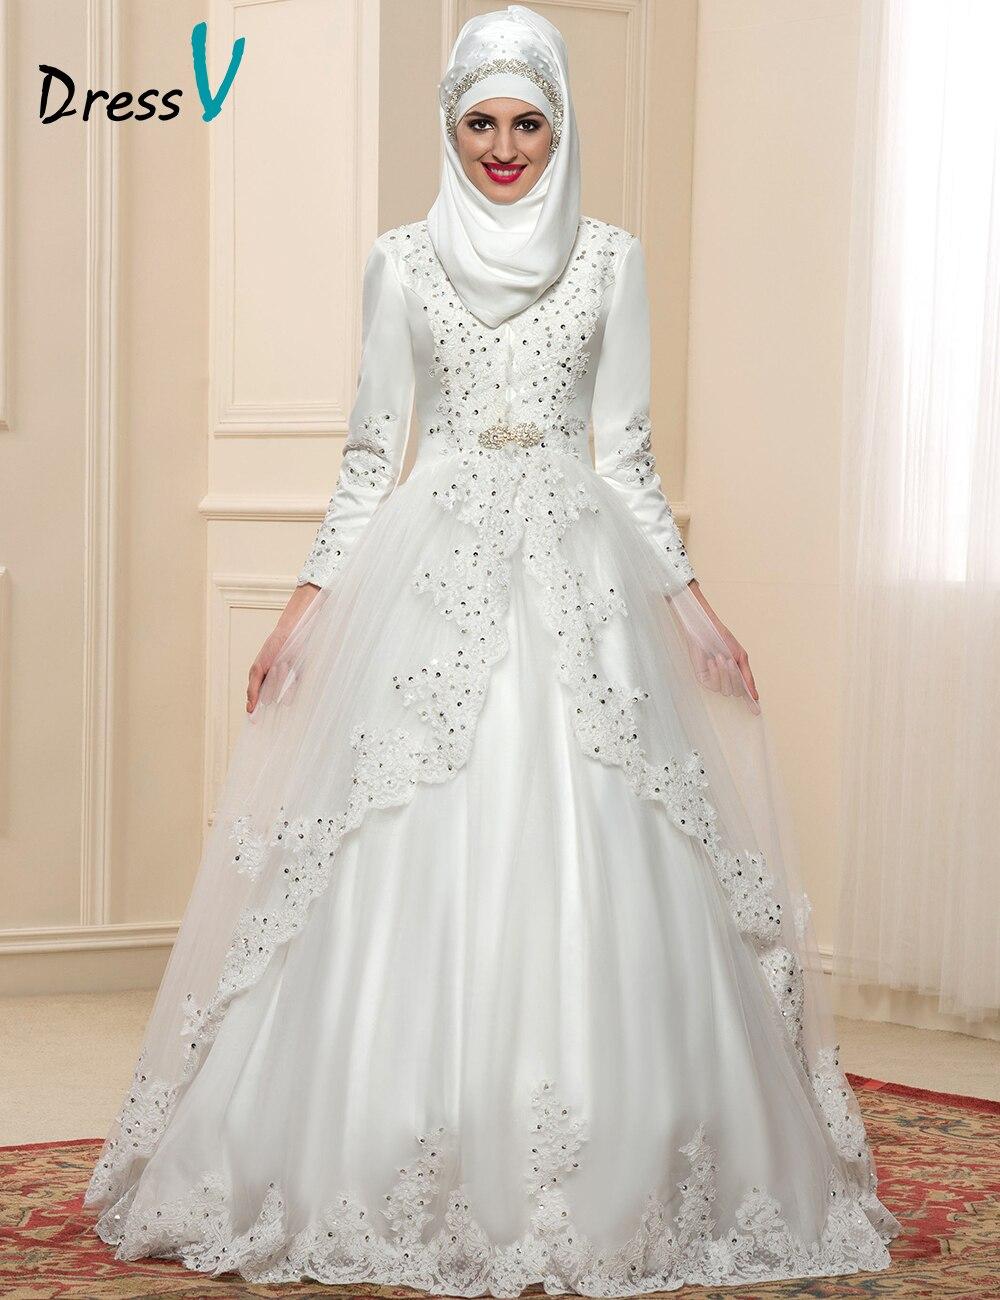 Luxury Long Sleeves Muslim Wedding Dresses Hijab High Neck Vintage Dubai Bridal Gowns Applique Beaded Kaftan Abiti Da Sposa In From Weddings